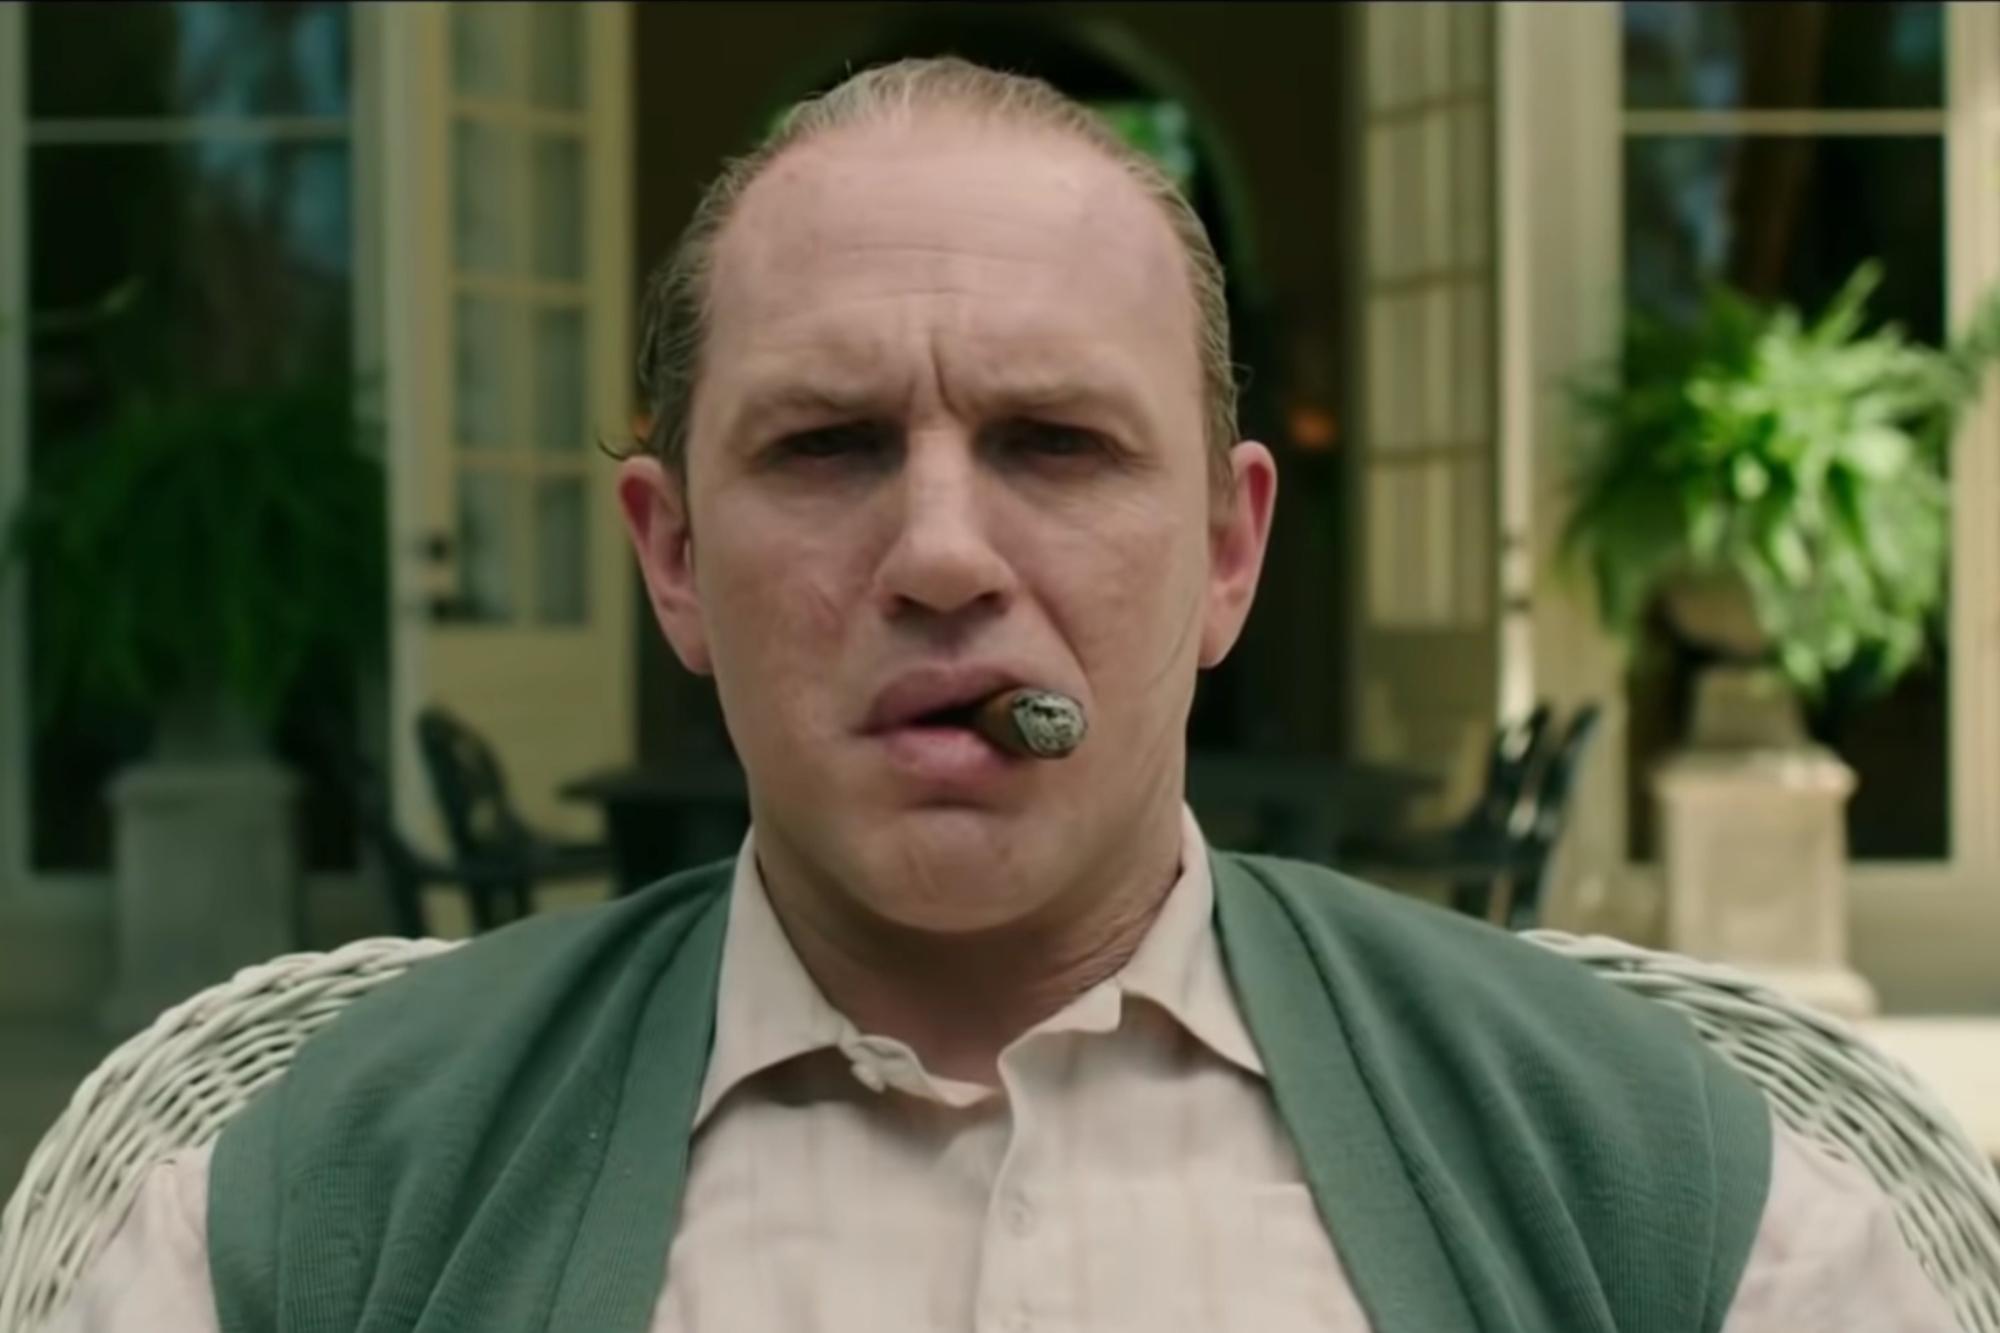 See Tom Hardy Portray Dementia-Stricken Gangster in 'Capone' Trailer